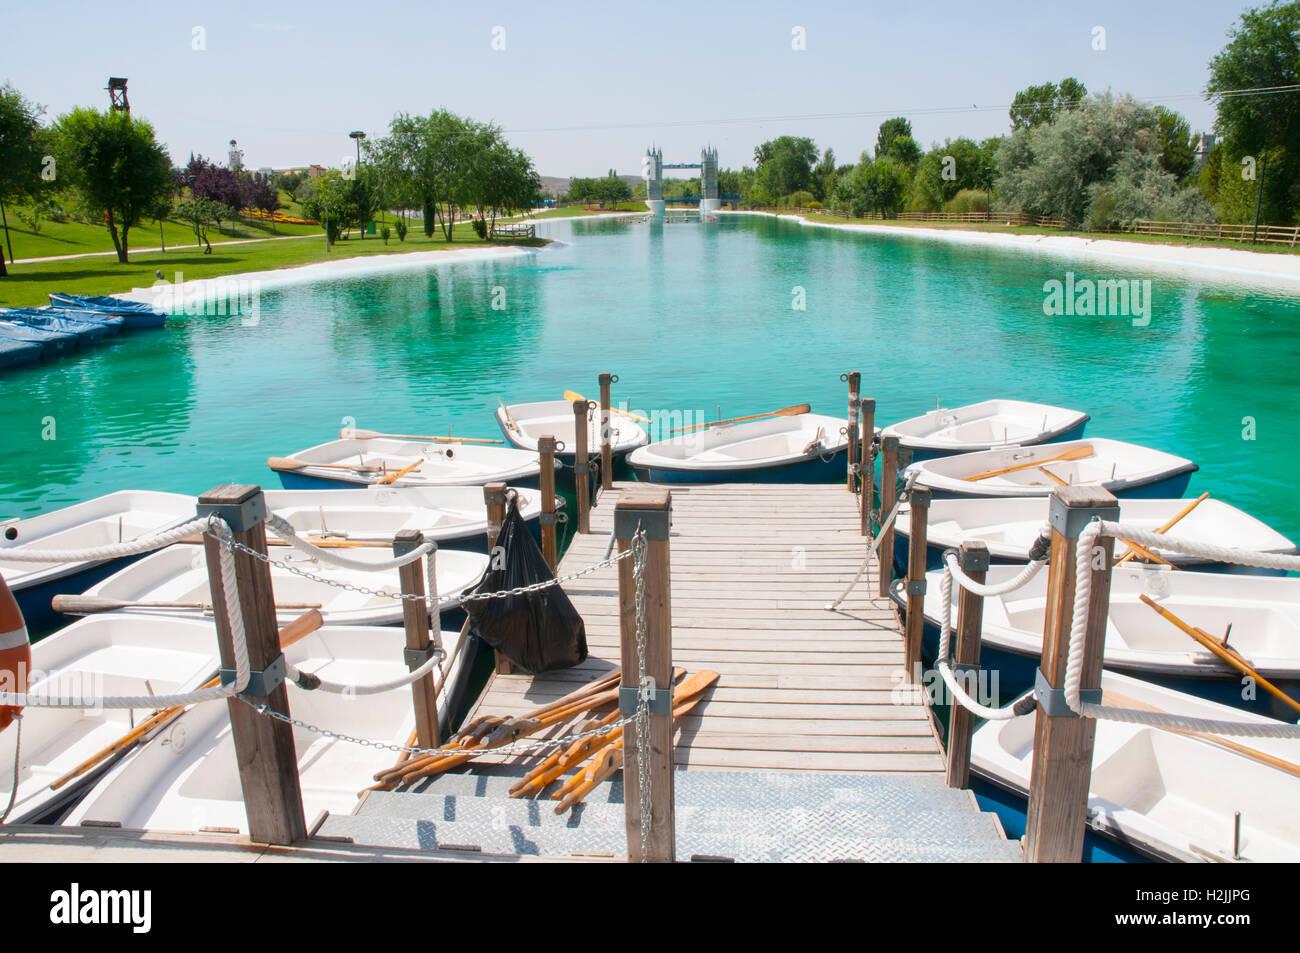 Jetty and pond. Parque Europa, Torrejon de Ardoz, Madrid province, Spain. - Stock Image